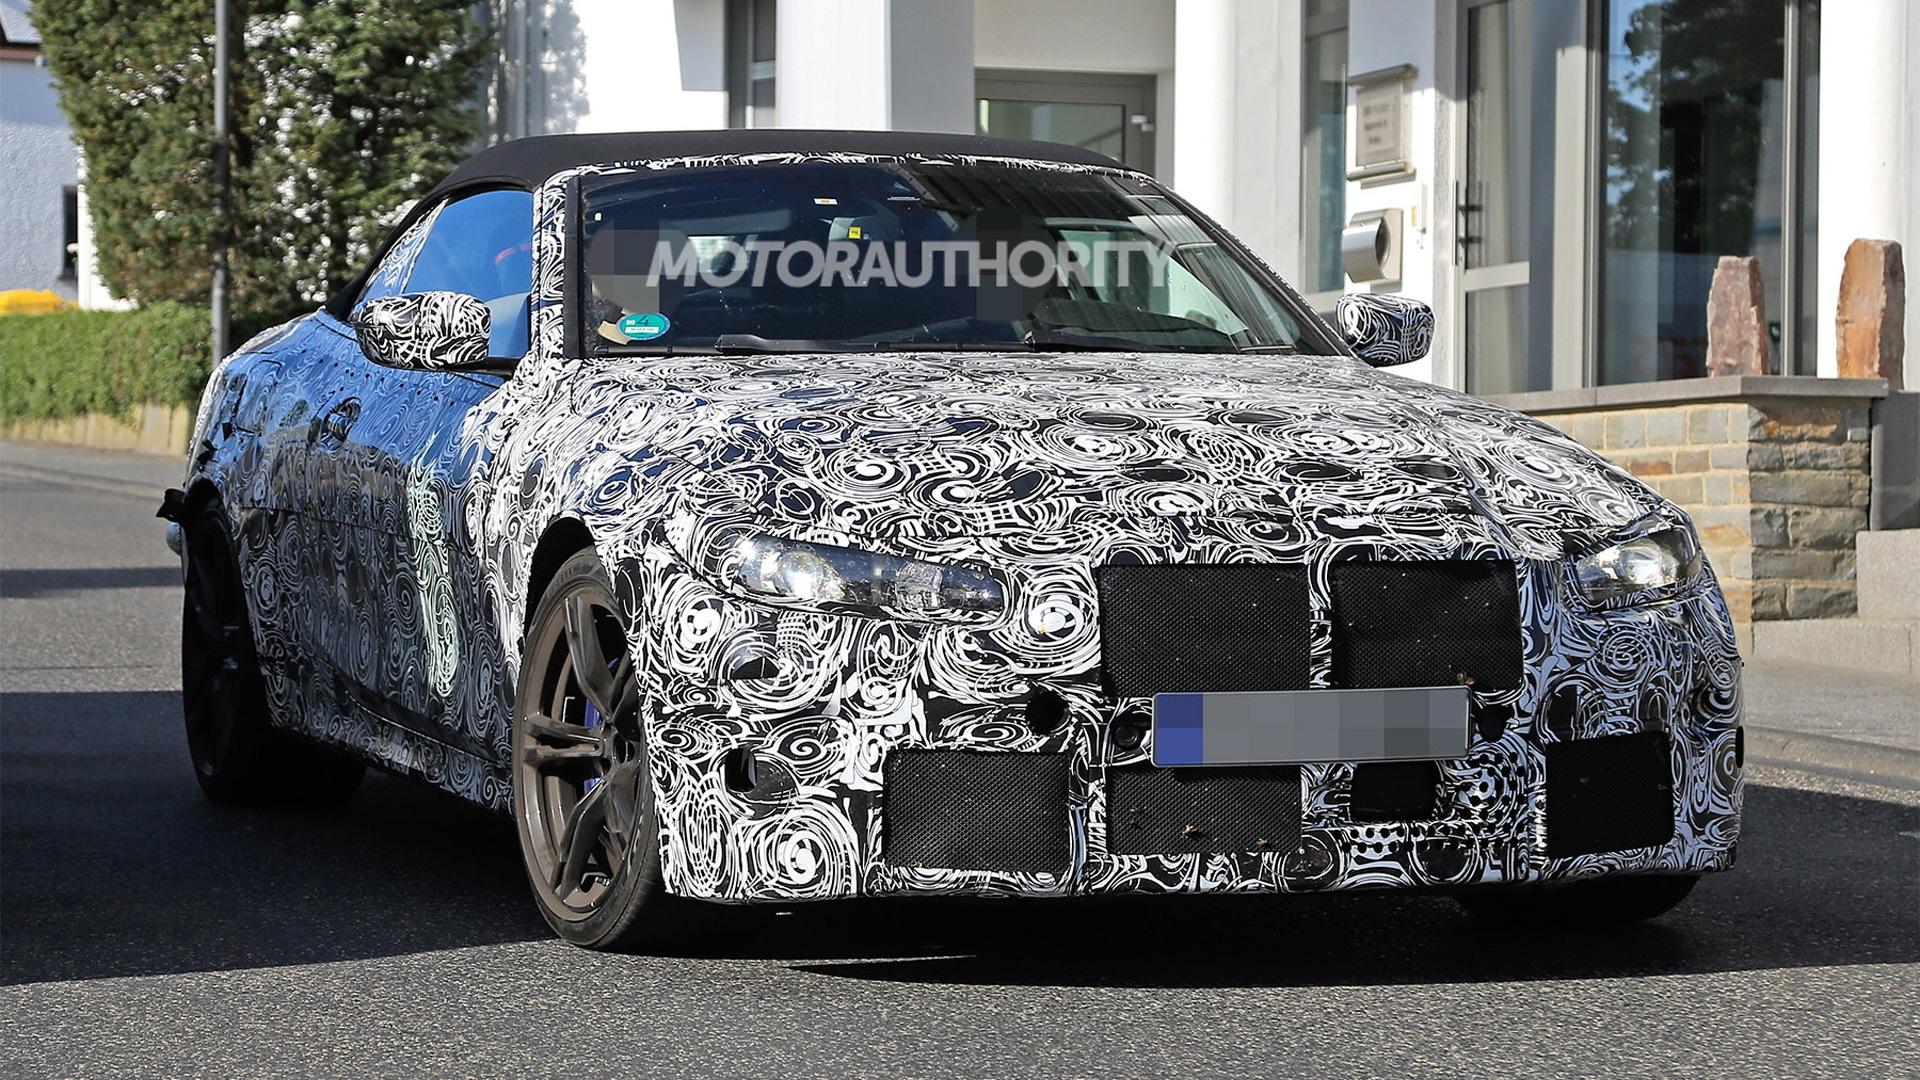 2021 BMW M4 Convertible spy shots - Image via S. Baldauf/SB-Medien